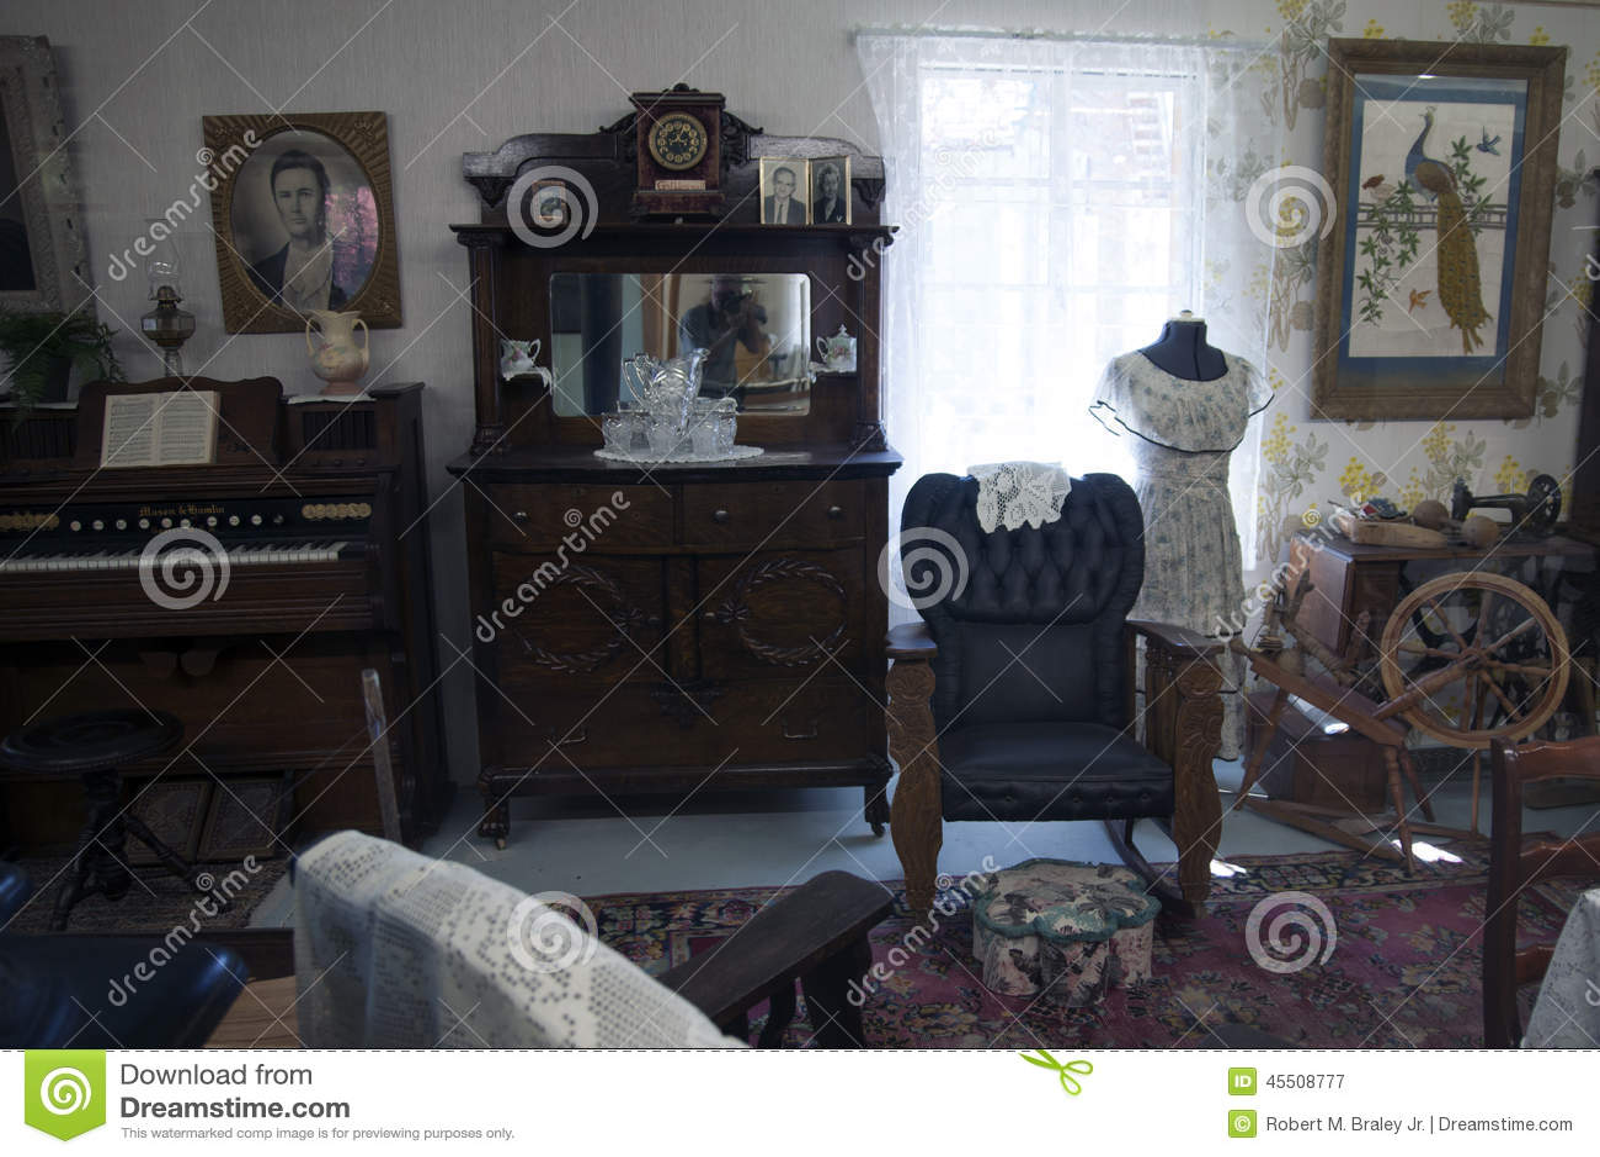 Vintage House Interior